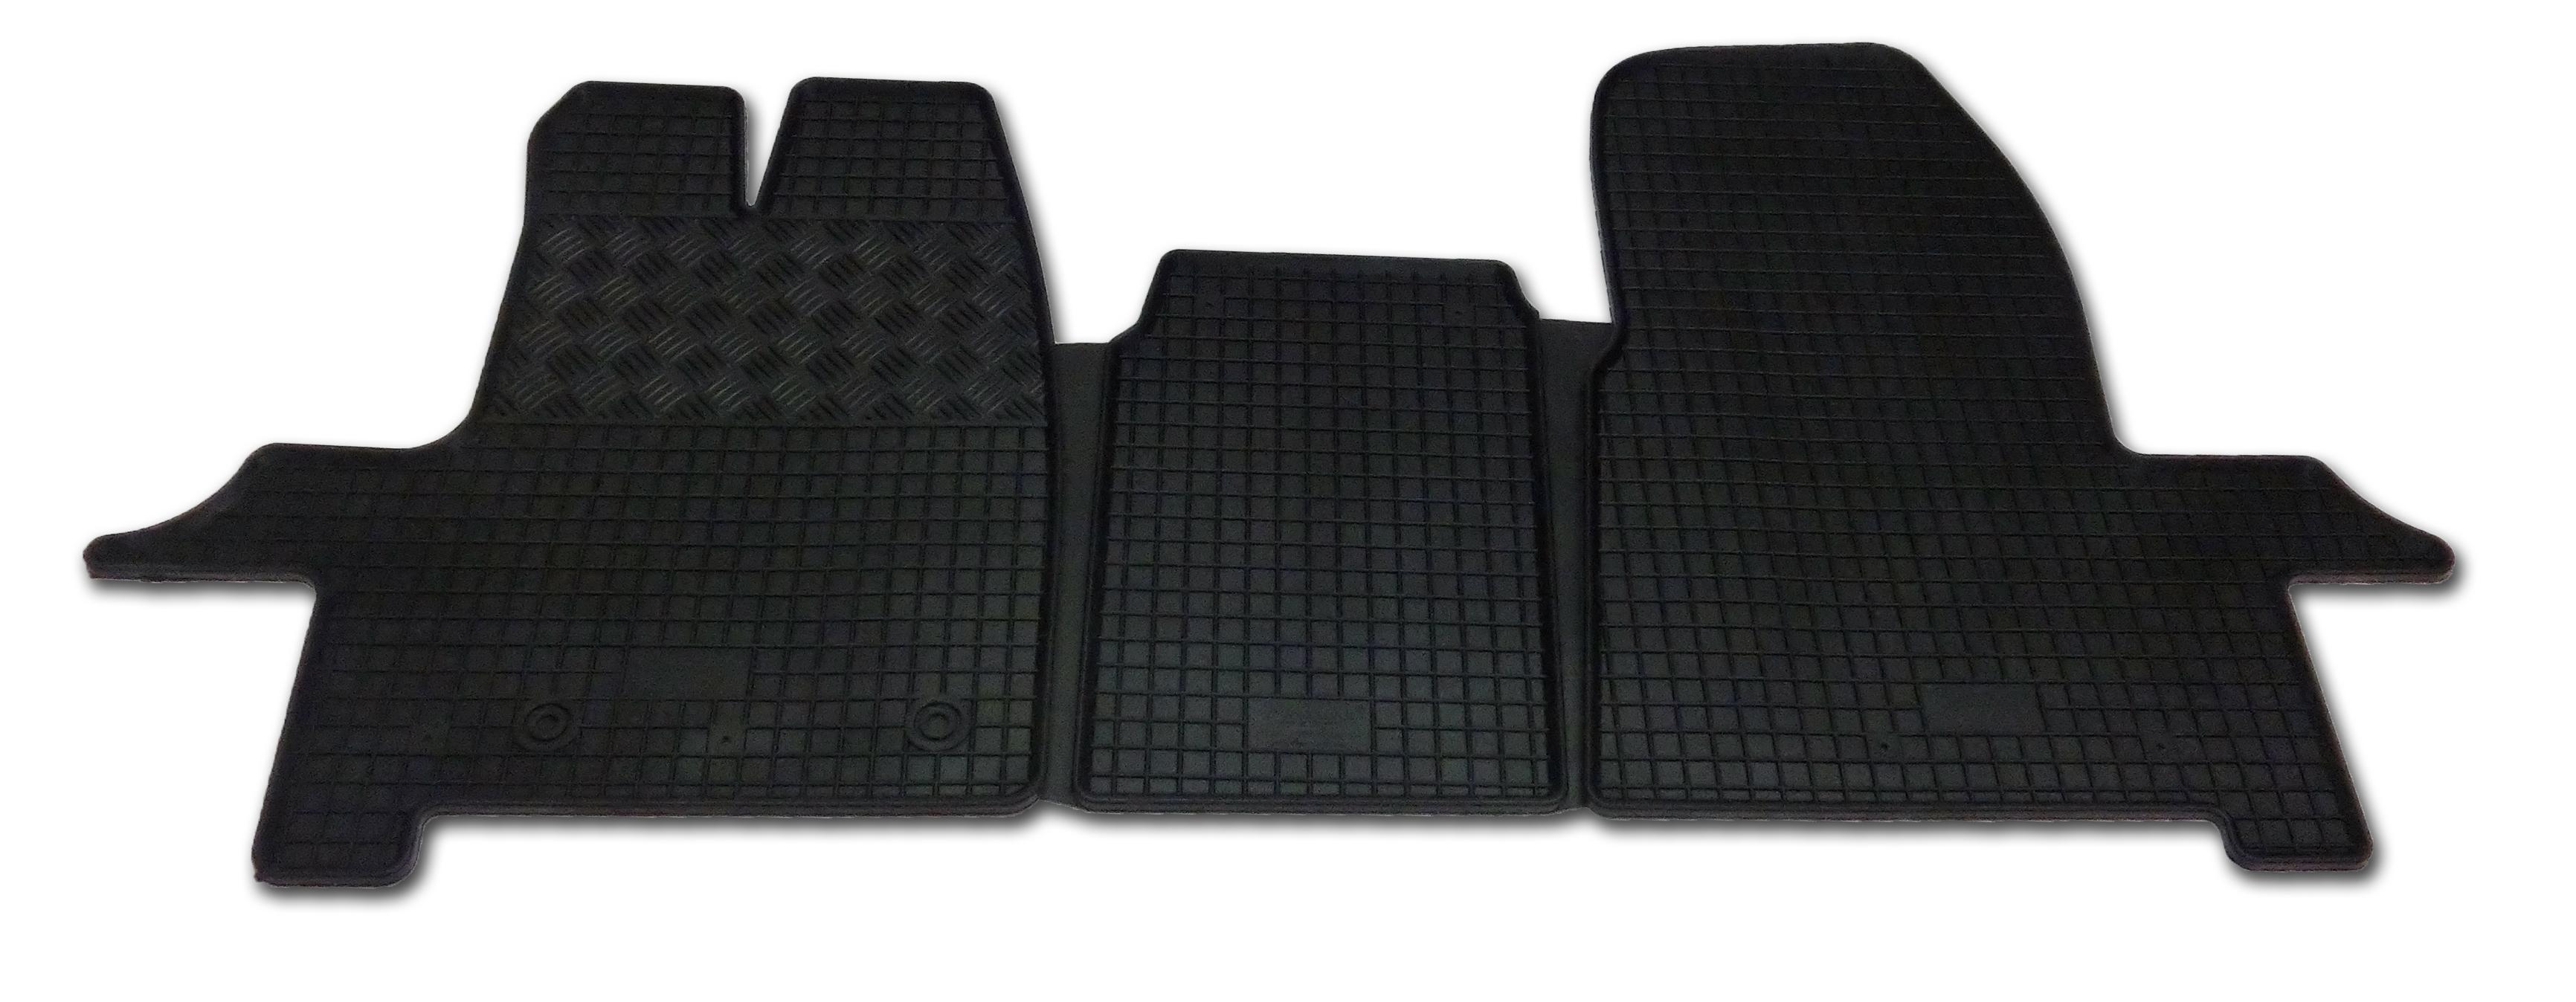 Automega Gumové autokoberce RIGUM Ford Transit / Tourneo Custom 2 místný (1+1) 2012-2018